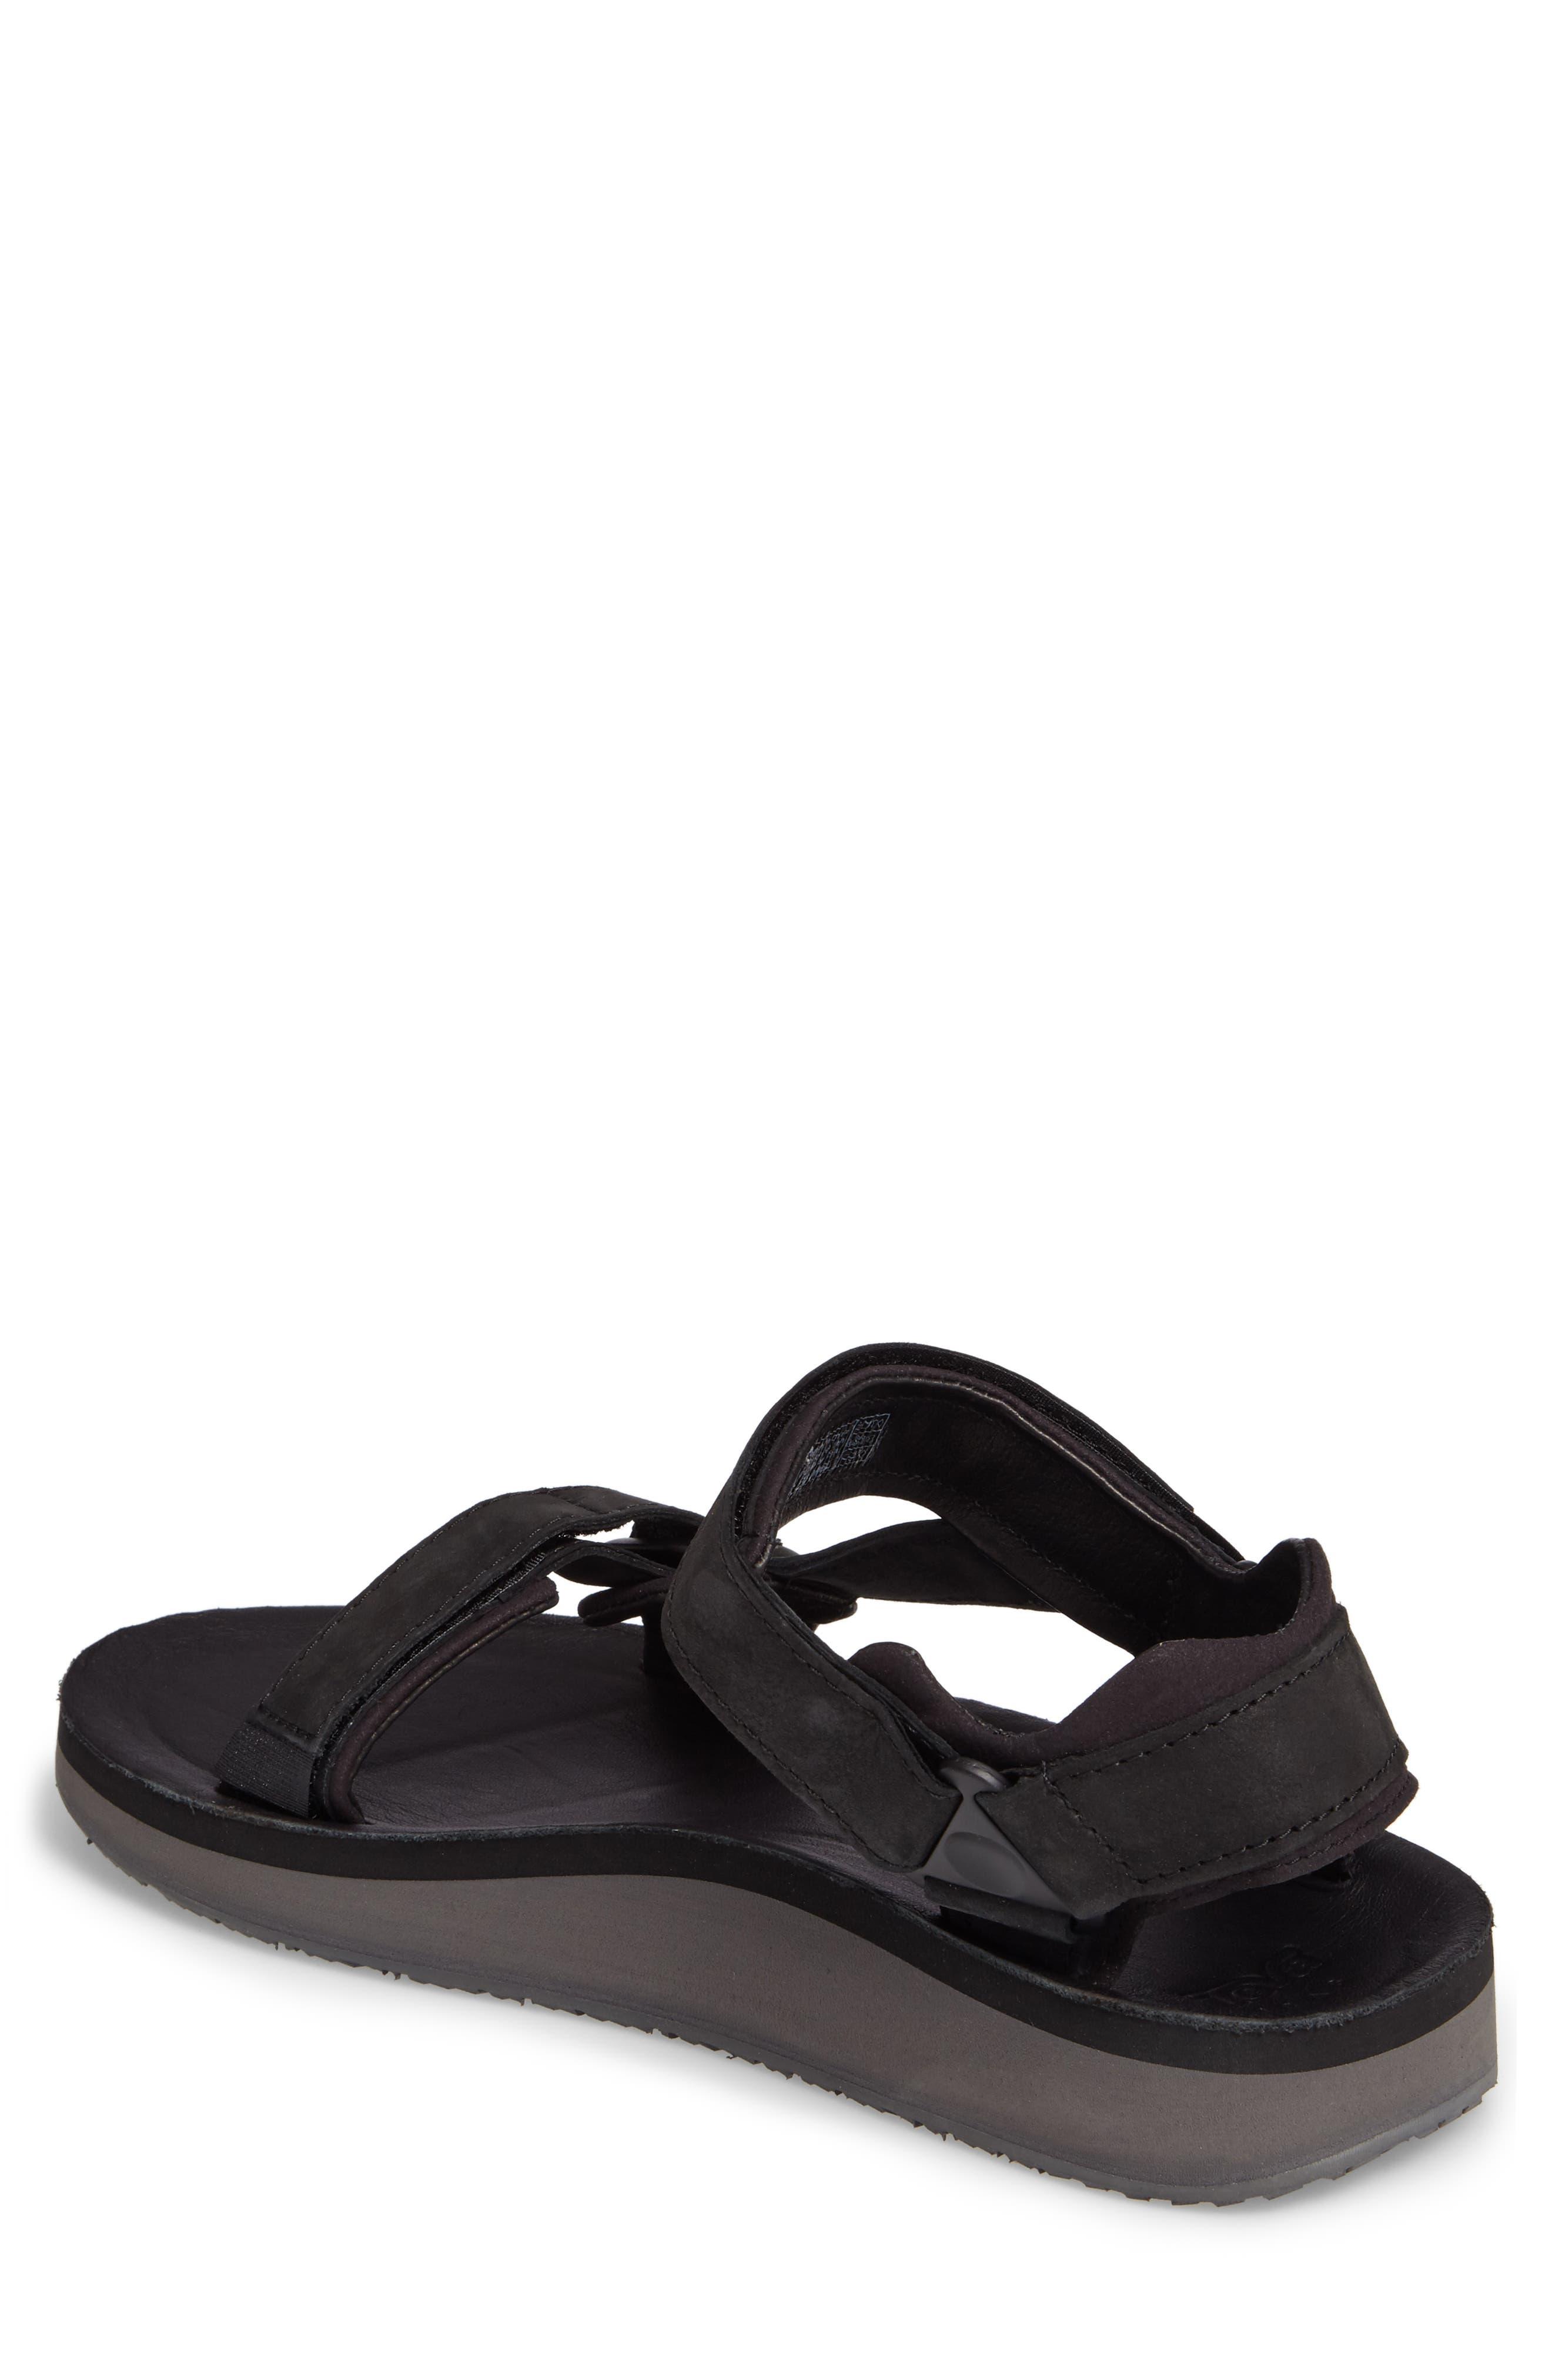 Alternate Image 2  - Teva Original Universal Premier Sandal (Men)